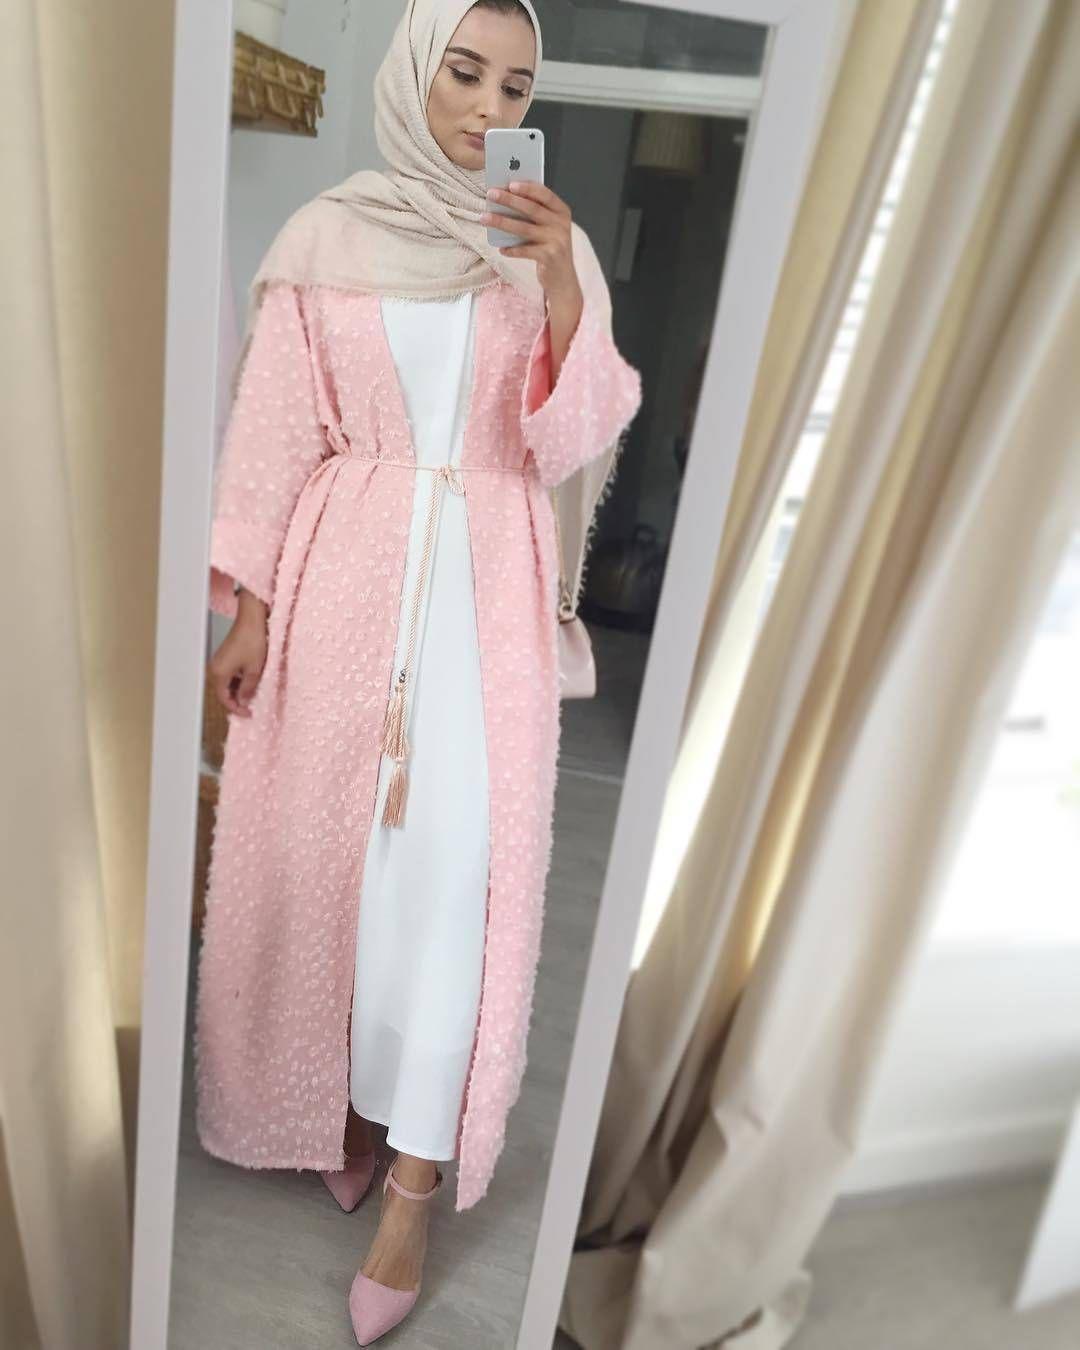 4 656 Likes 9 Comments Hijab Fashion Inspiration Hijab Fashioninspiration On Instagram